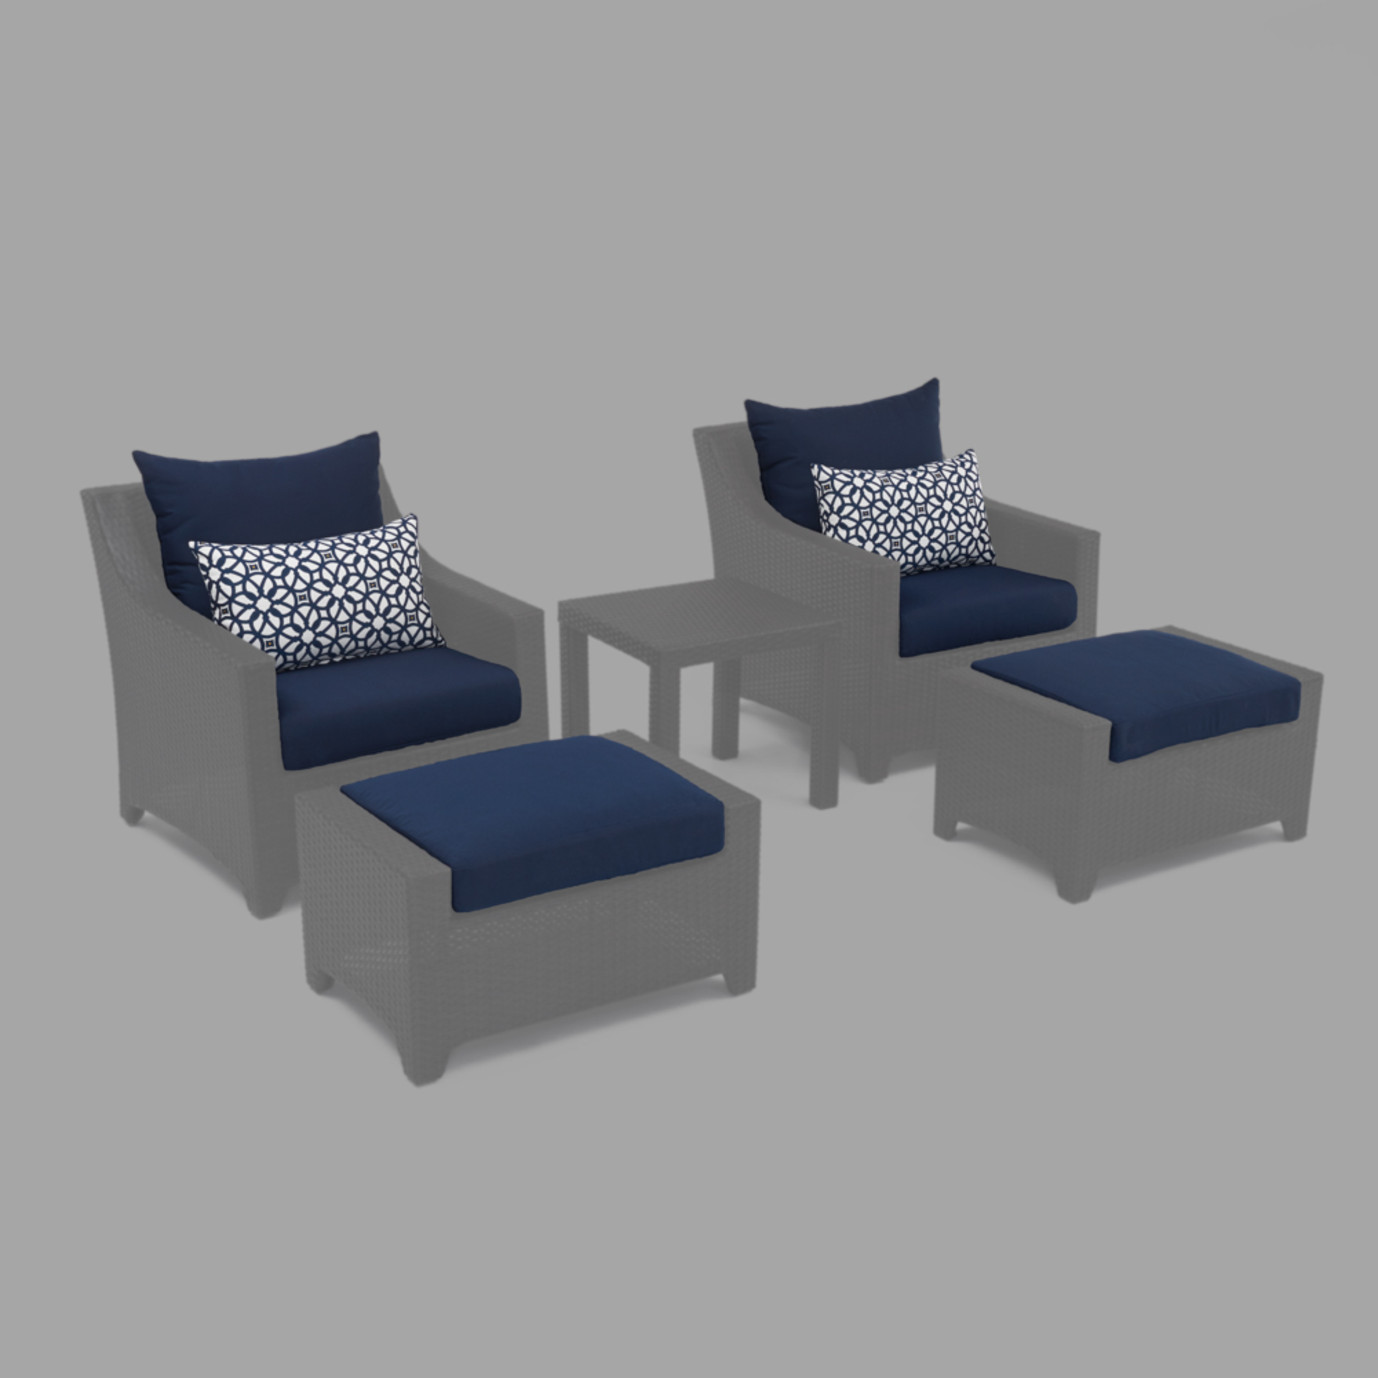 Modular Outdoor 5 Piece Club Cushion Cover Set - Navy Blue